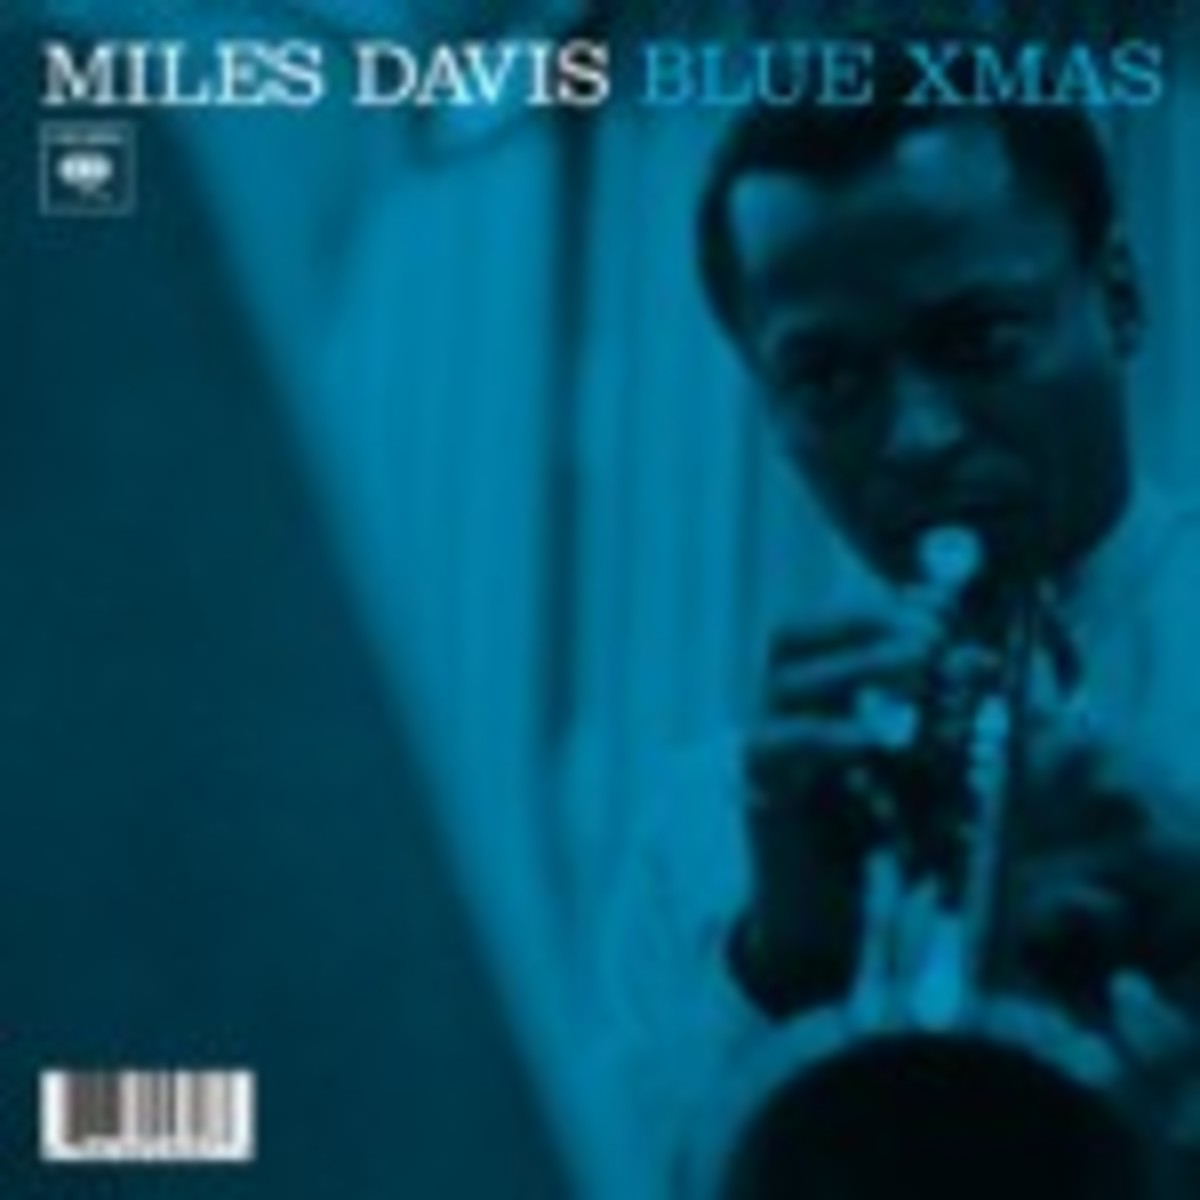 Miles Davis Blue Christmas on vinyl